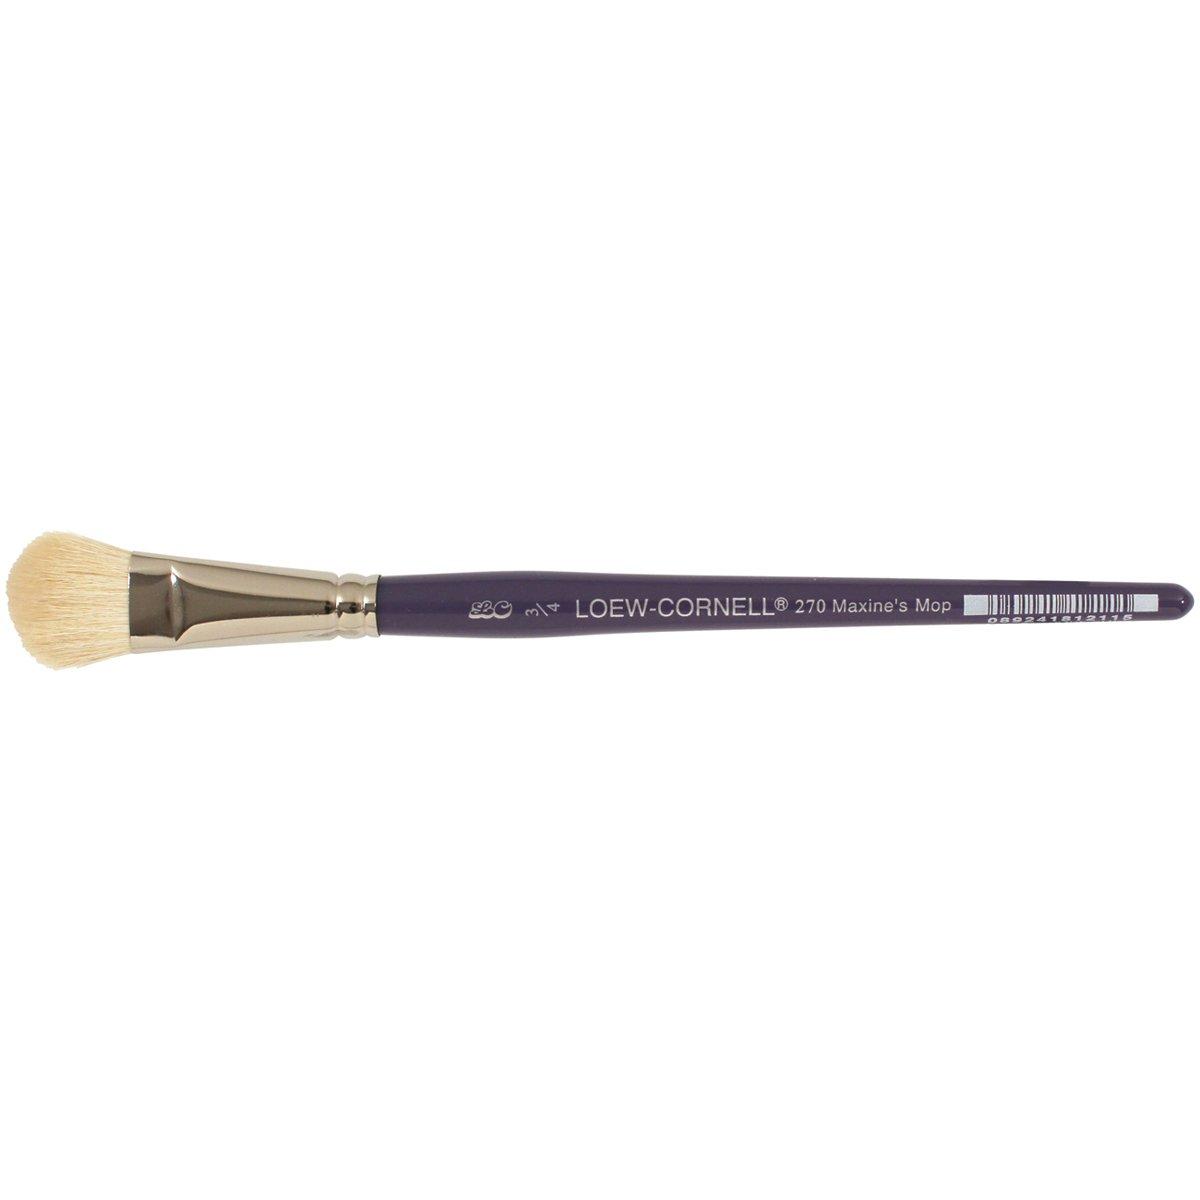 Loew-Cornell 3/4-Inch 270 Maxine Thomas Mop Artist Brush, Goat Hair